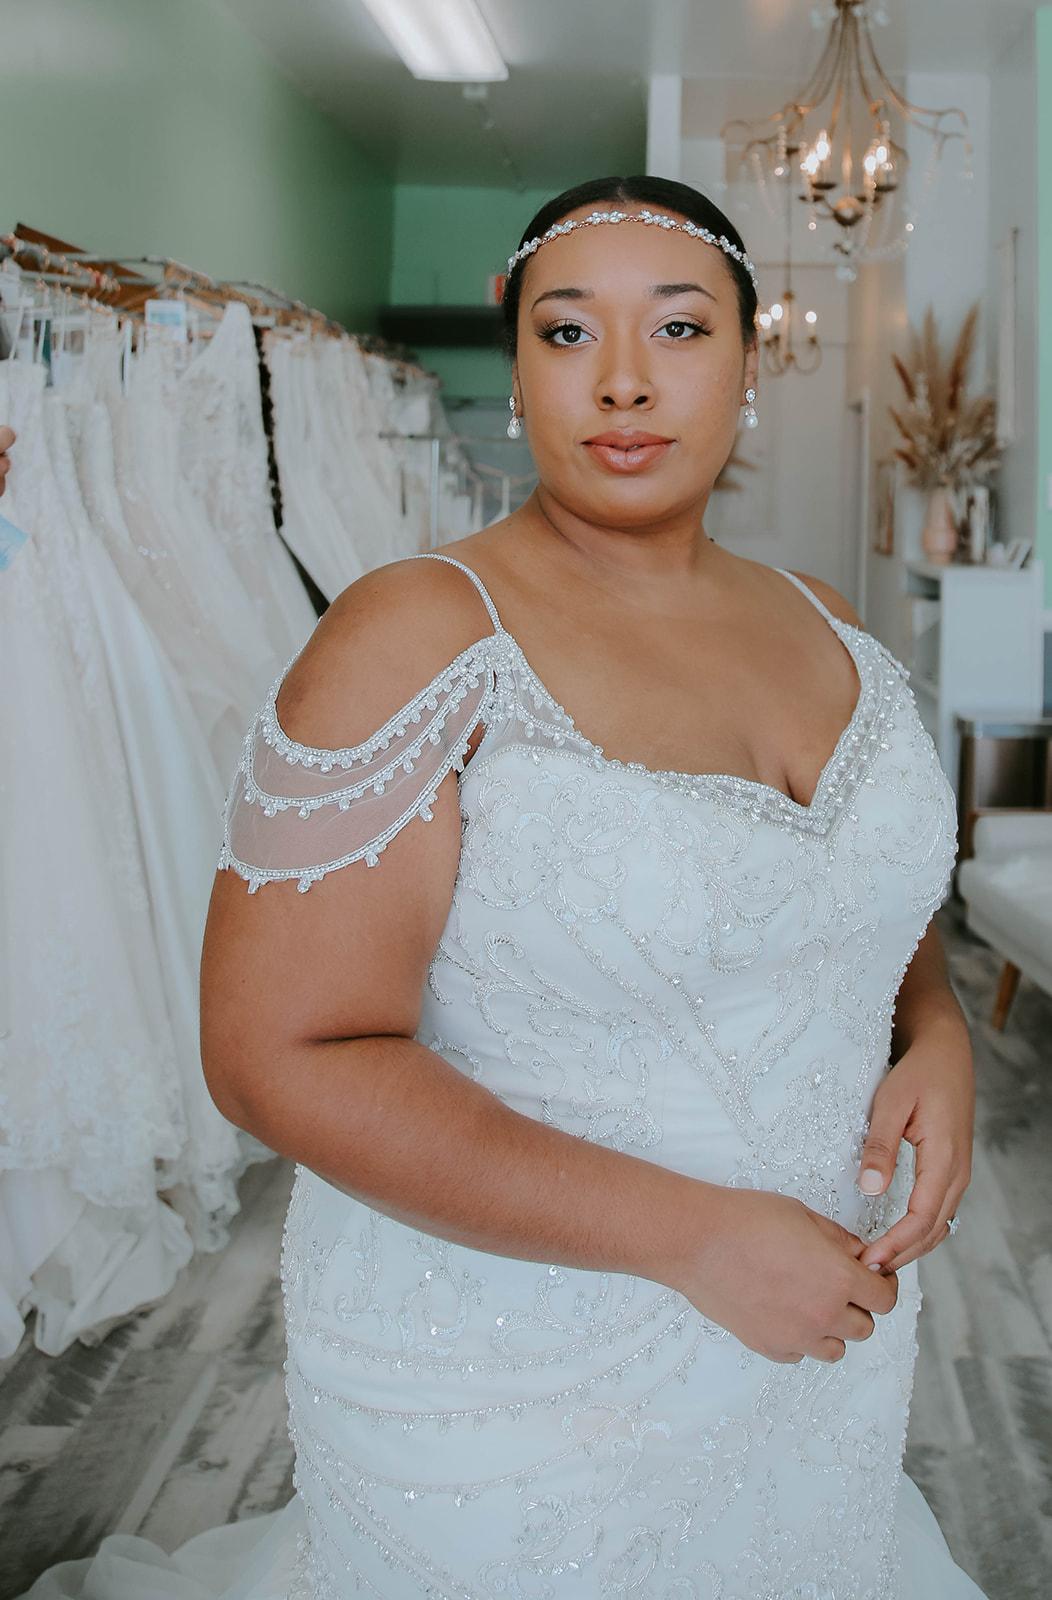 Model wearing Brinkley Lynette Off the Shoulder Wedding Dress by Maggie Sottero